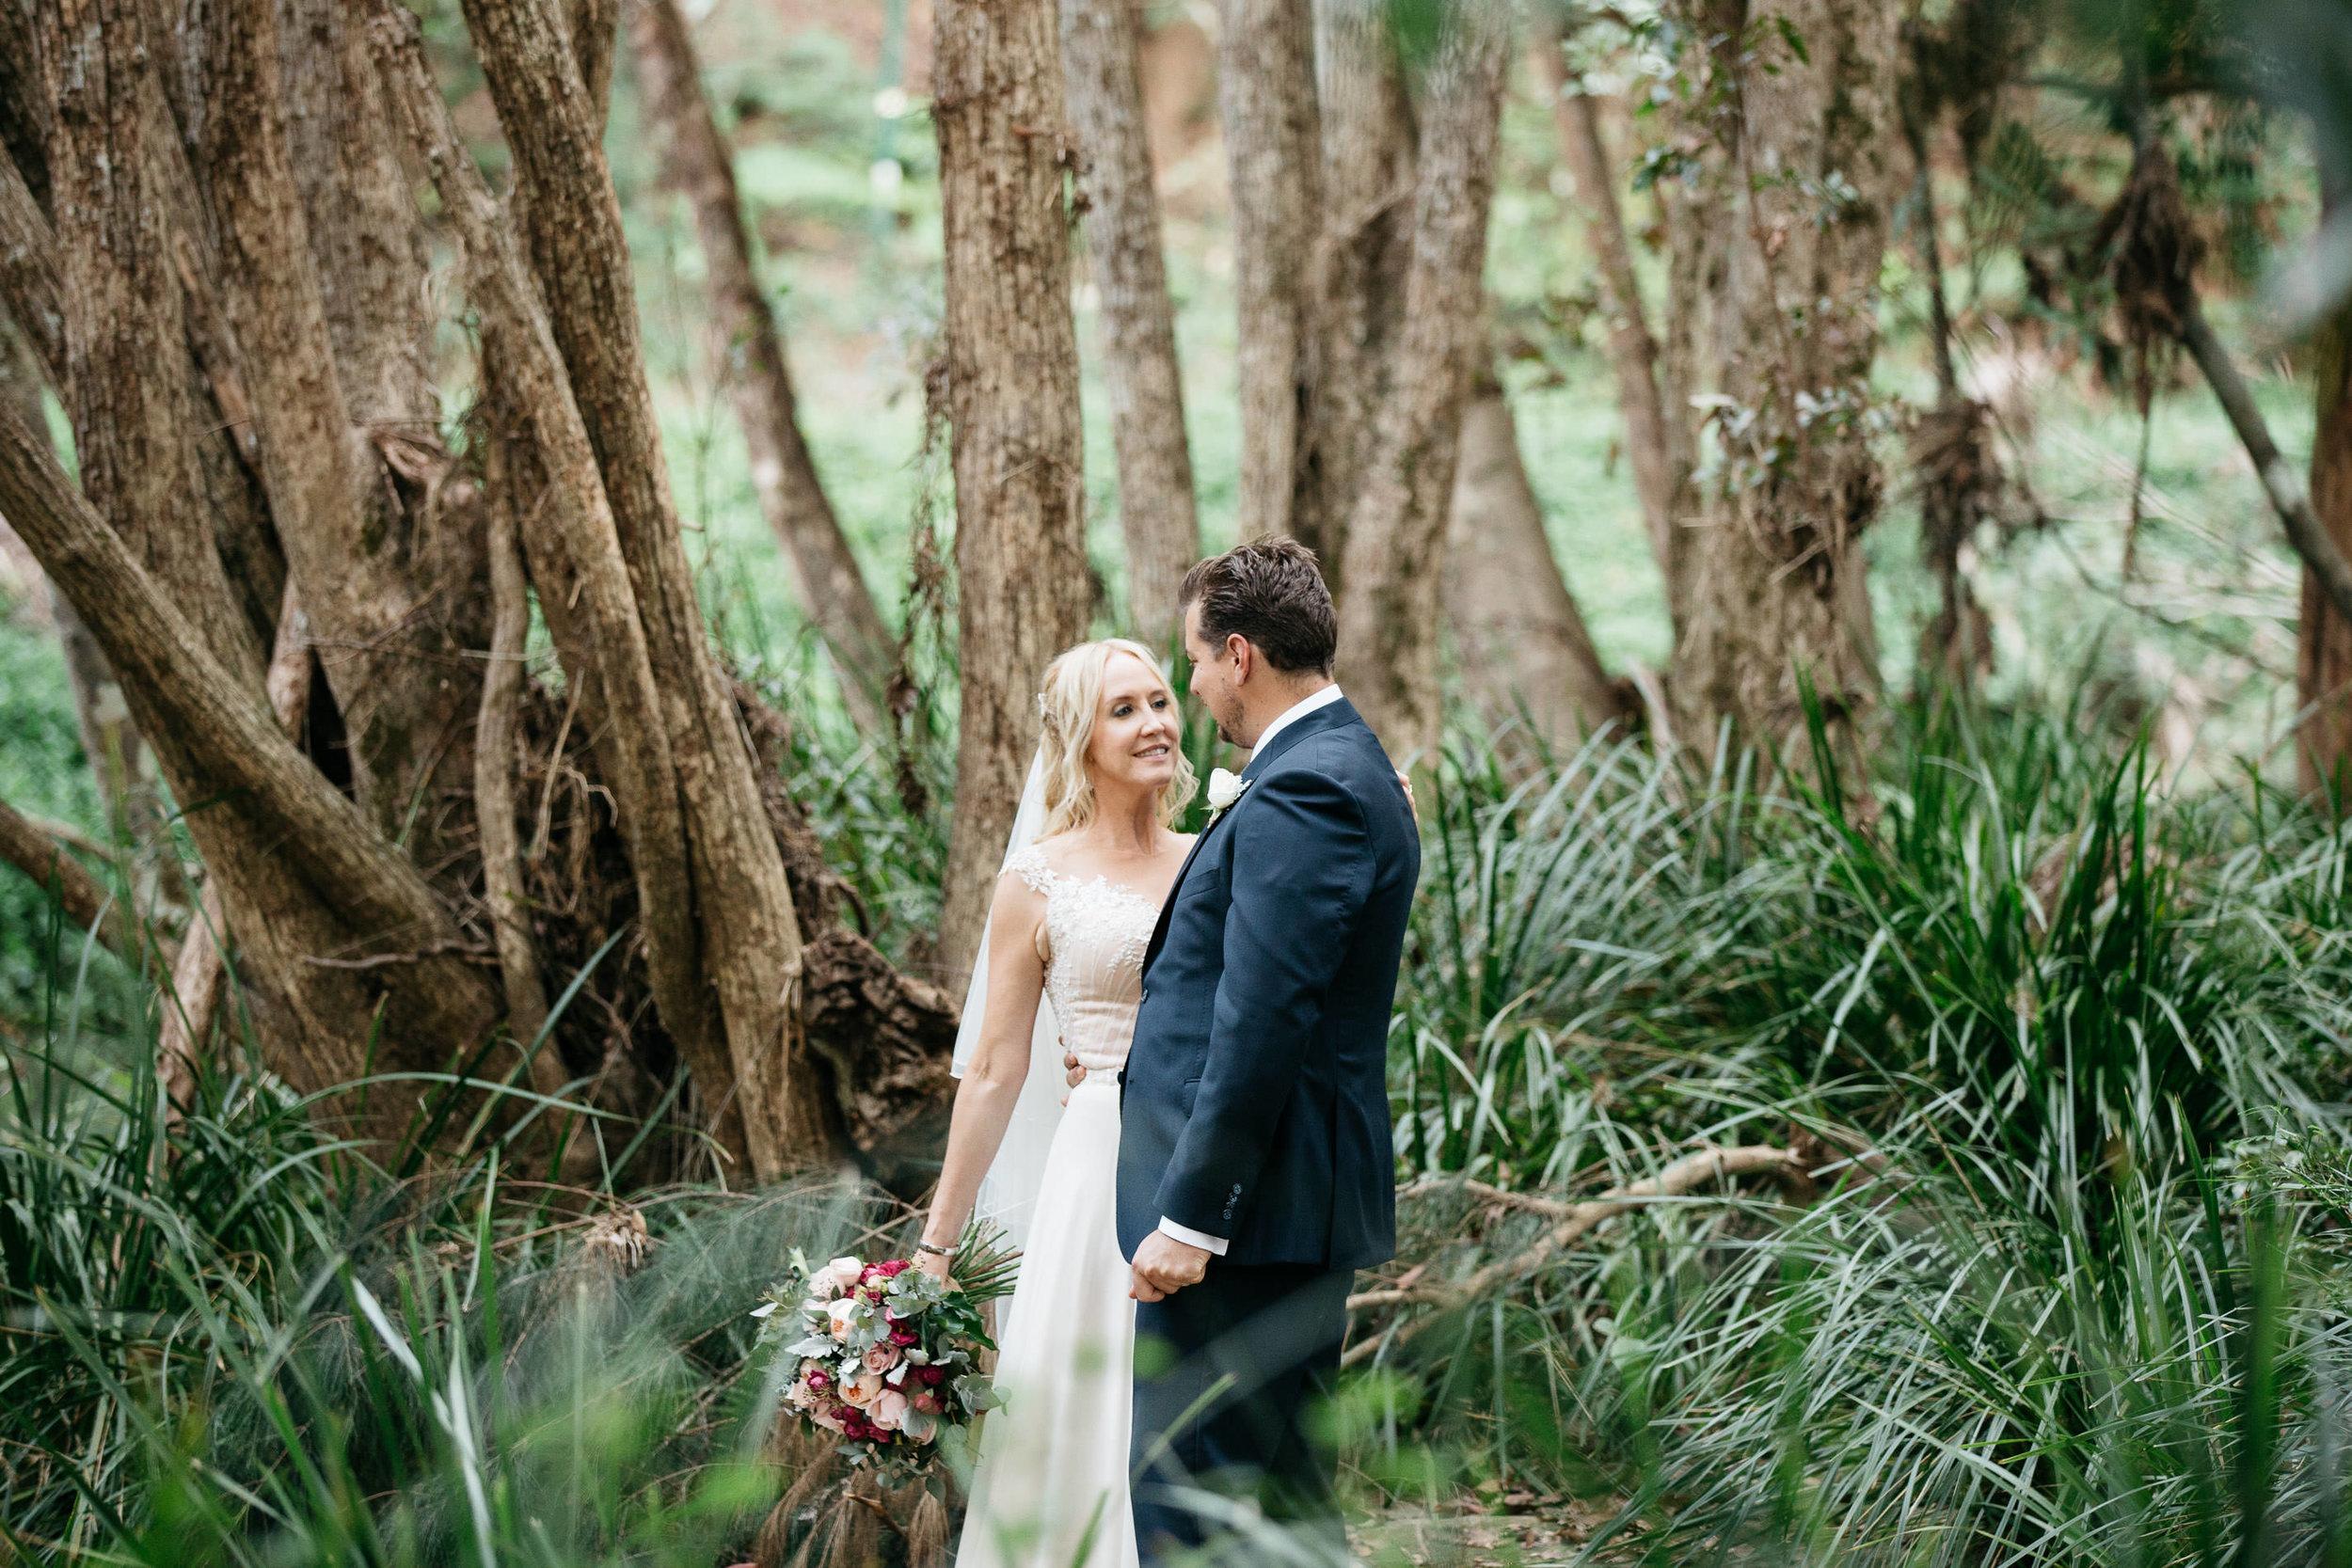 True North Photography_Boomerang Farm_Stacey and Isaac_Gold Coast Wedding_Barm Wedding_Hinterland Wedding-146.jpg